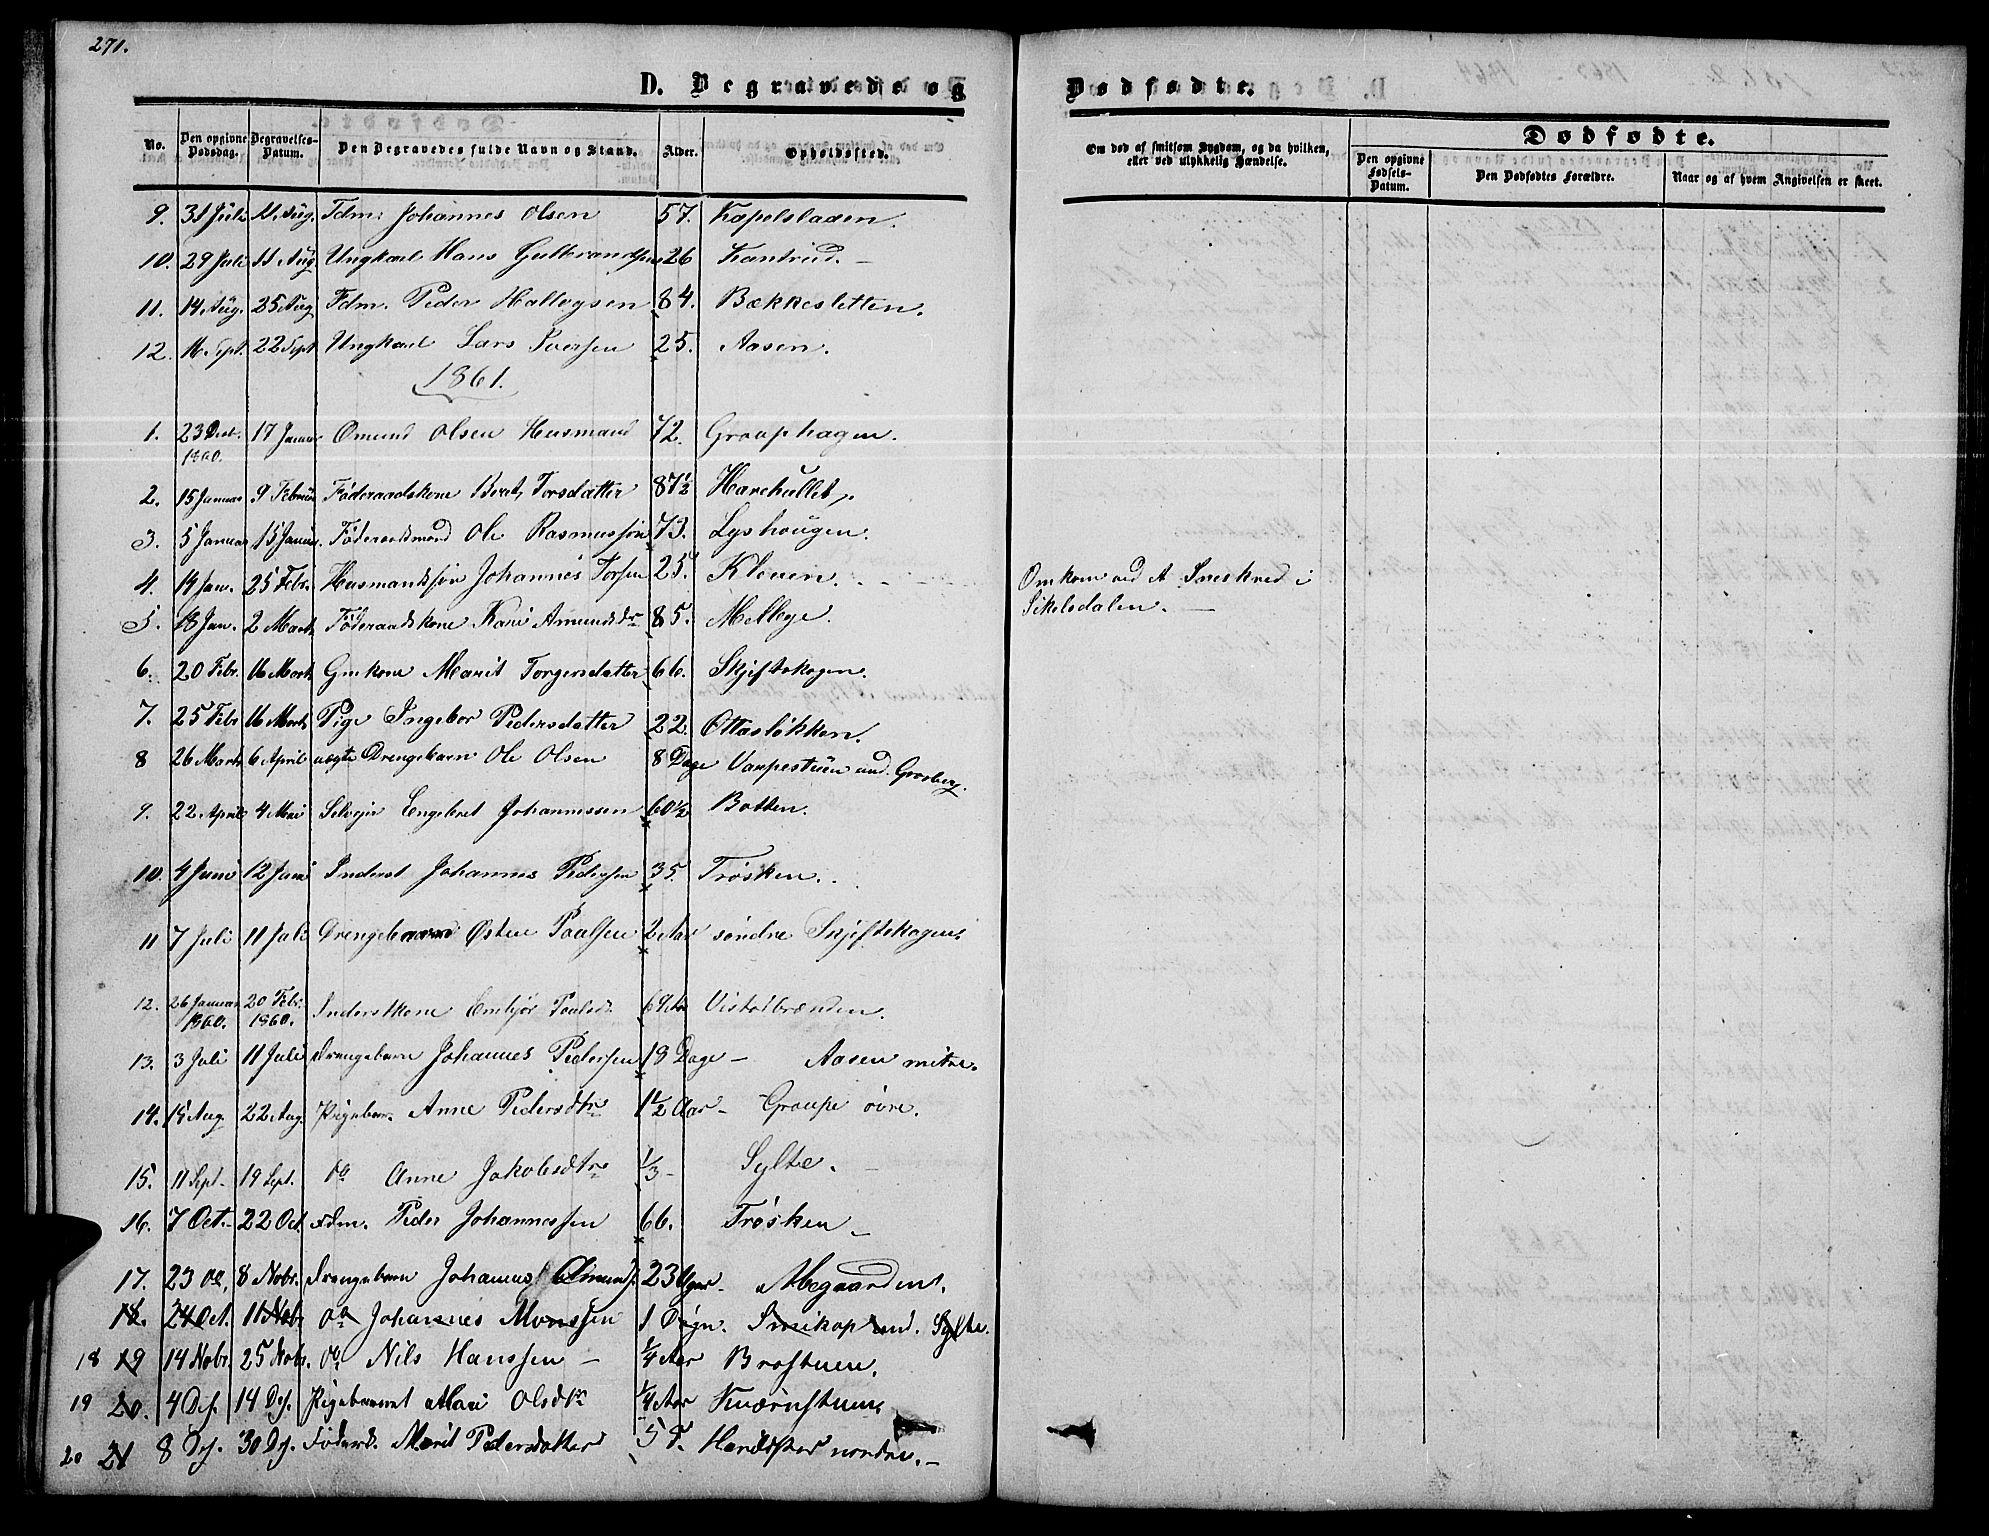 SAH, Nord-Fron prestekontor, Klokkerbok nr. 2, 1851-1883, s. 271